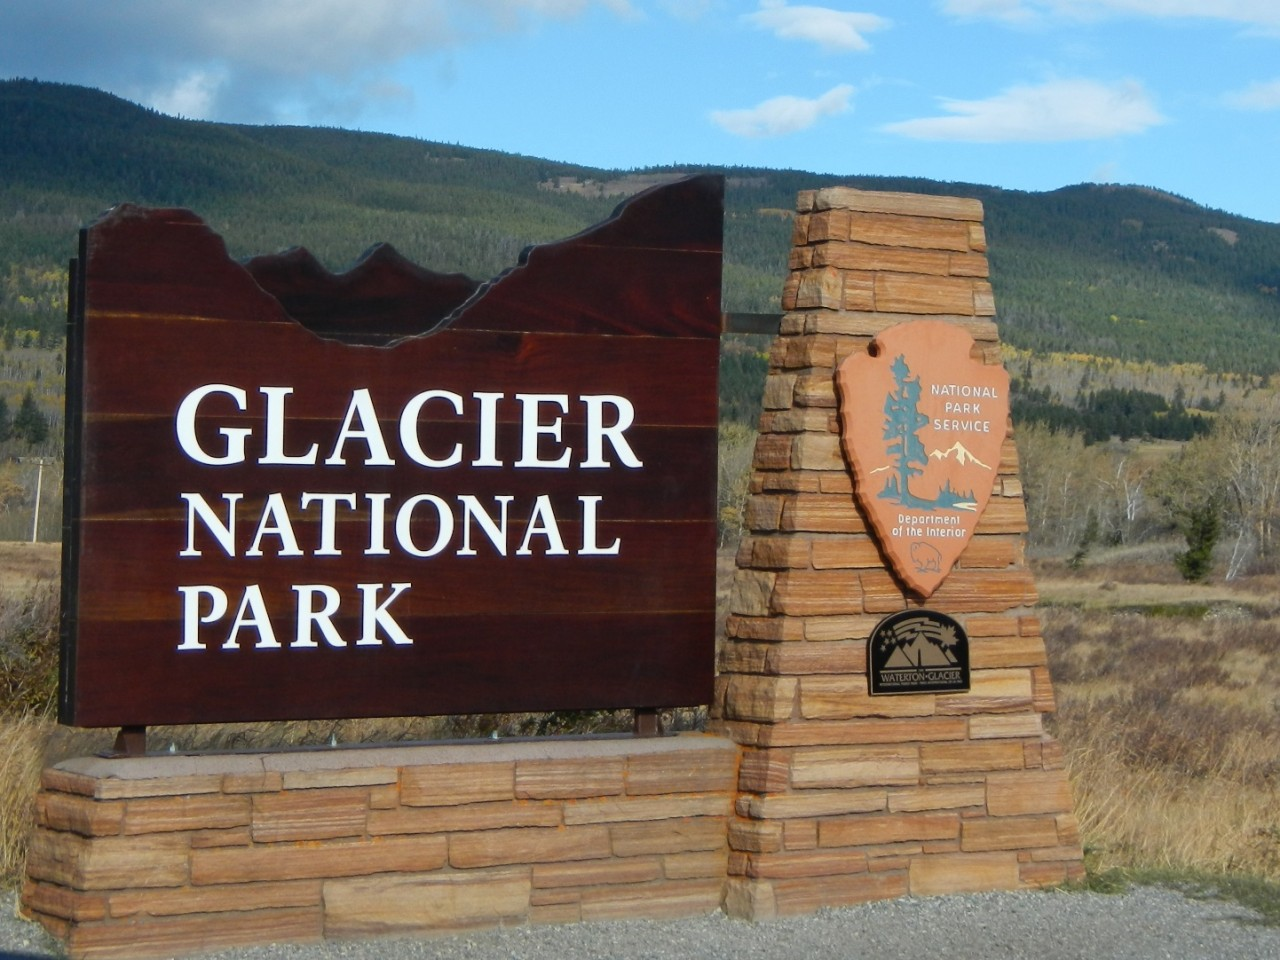 glacier national park road trip planner drive going to the sun road. Black Bedroom Furniture Sets. Home Design Ideas